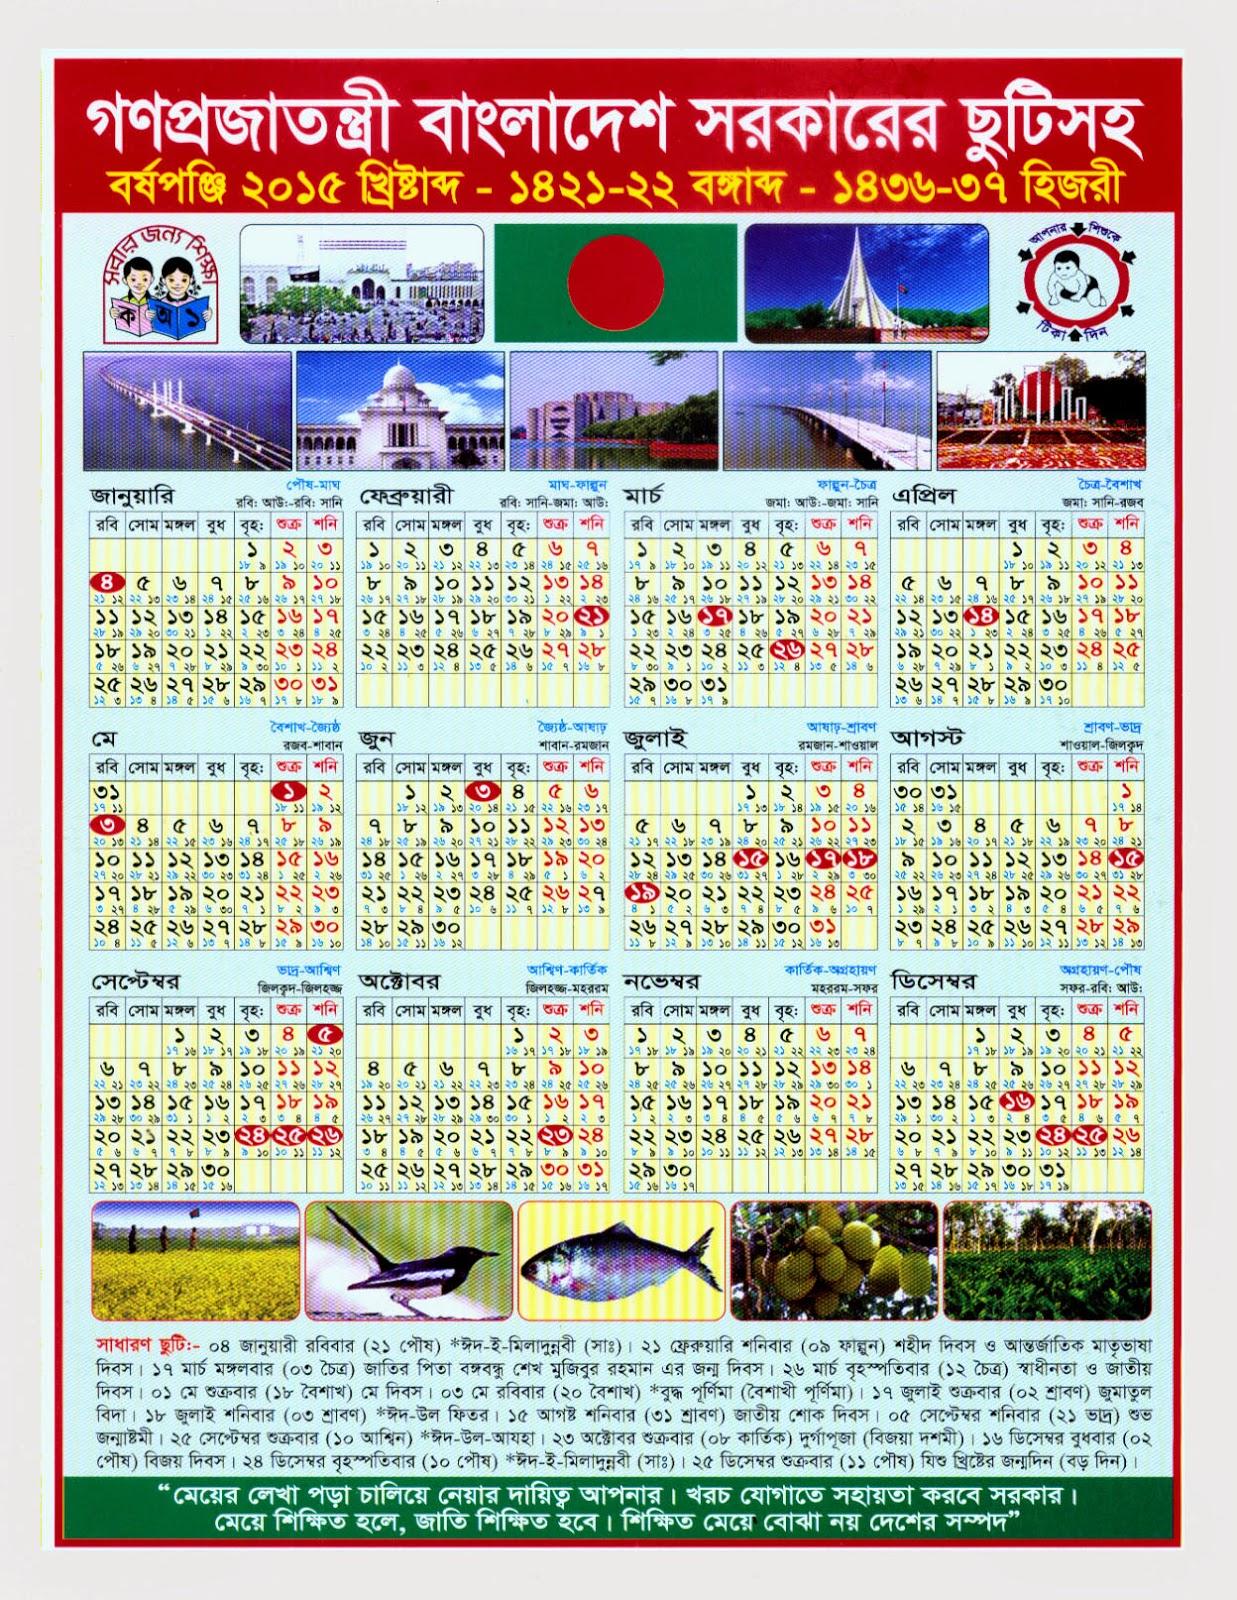 bd calendar 2016 pdf